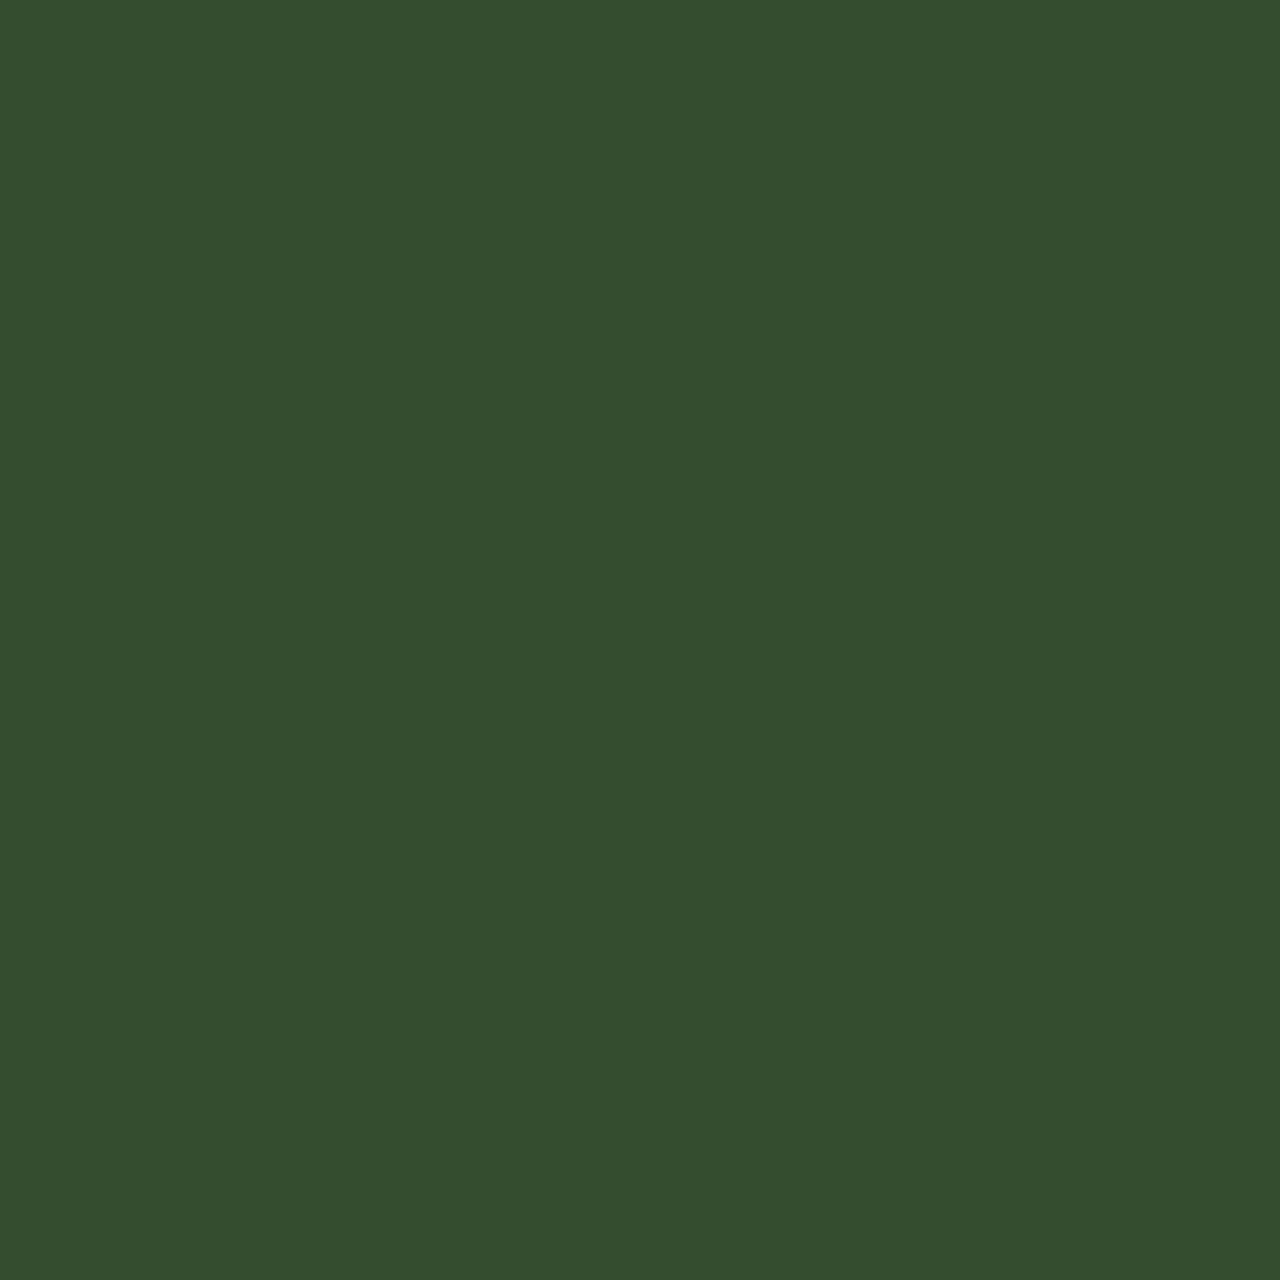 "#0122 Rosco Gels Roscolux Green Diffusion, 20x24"""